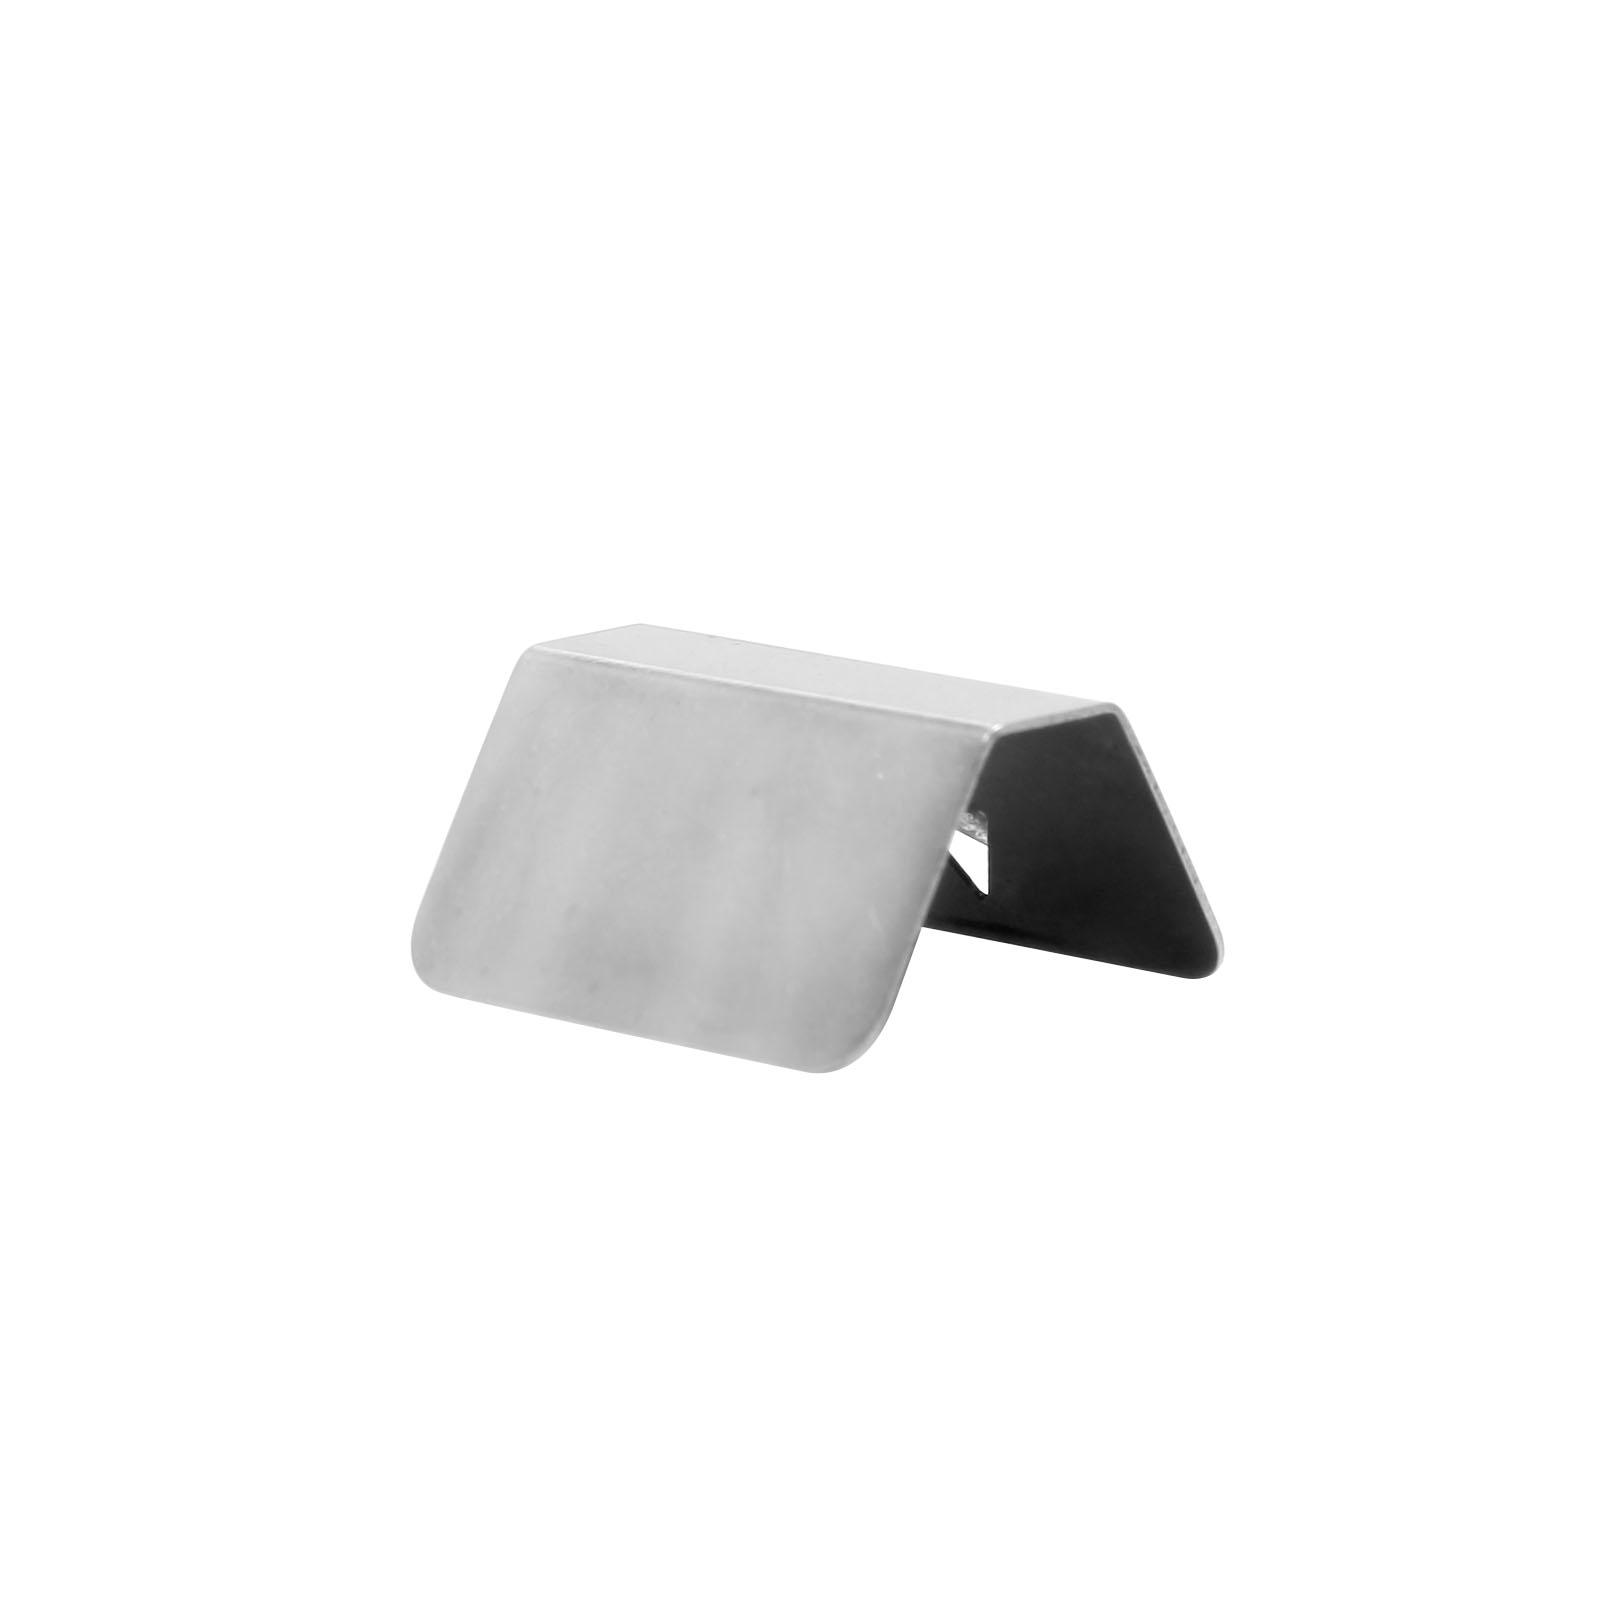 TPMS//Rdks Sensor for Kia Sportage Type SL//SLS January 2014/to January 2016/with Valve Item No 46892